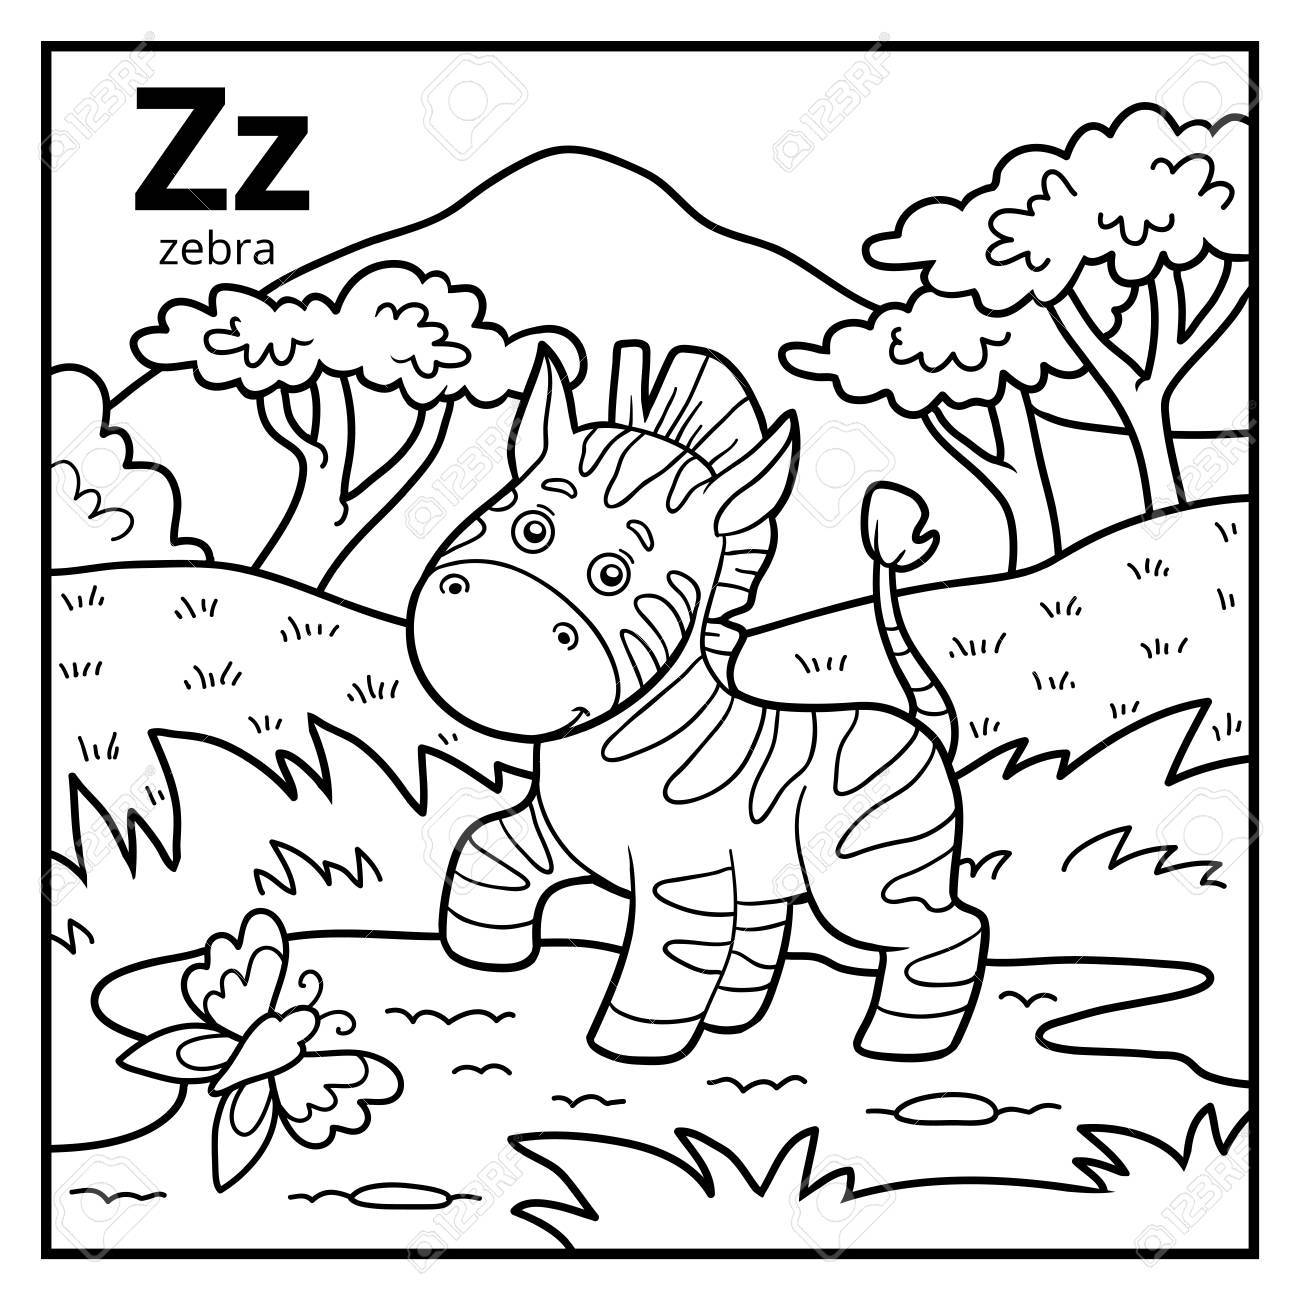 Coloring book for children, colorless alphabet. Letter Z, zebra